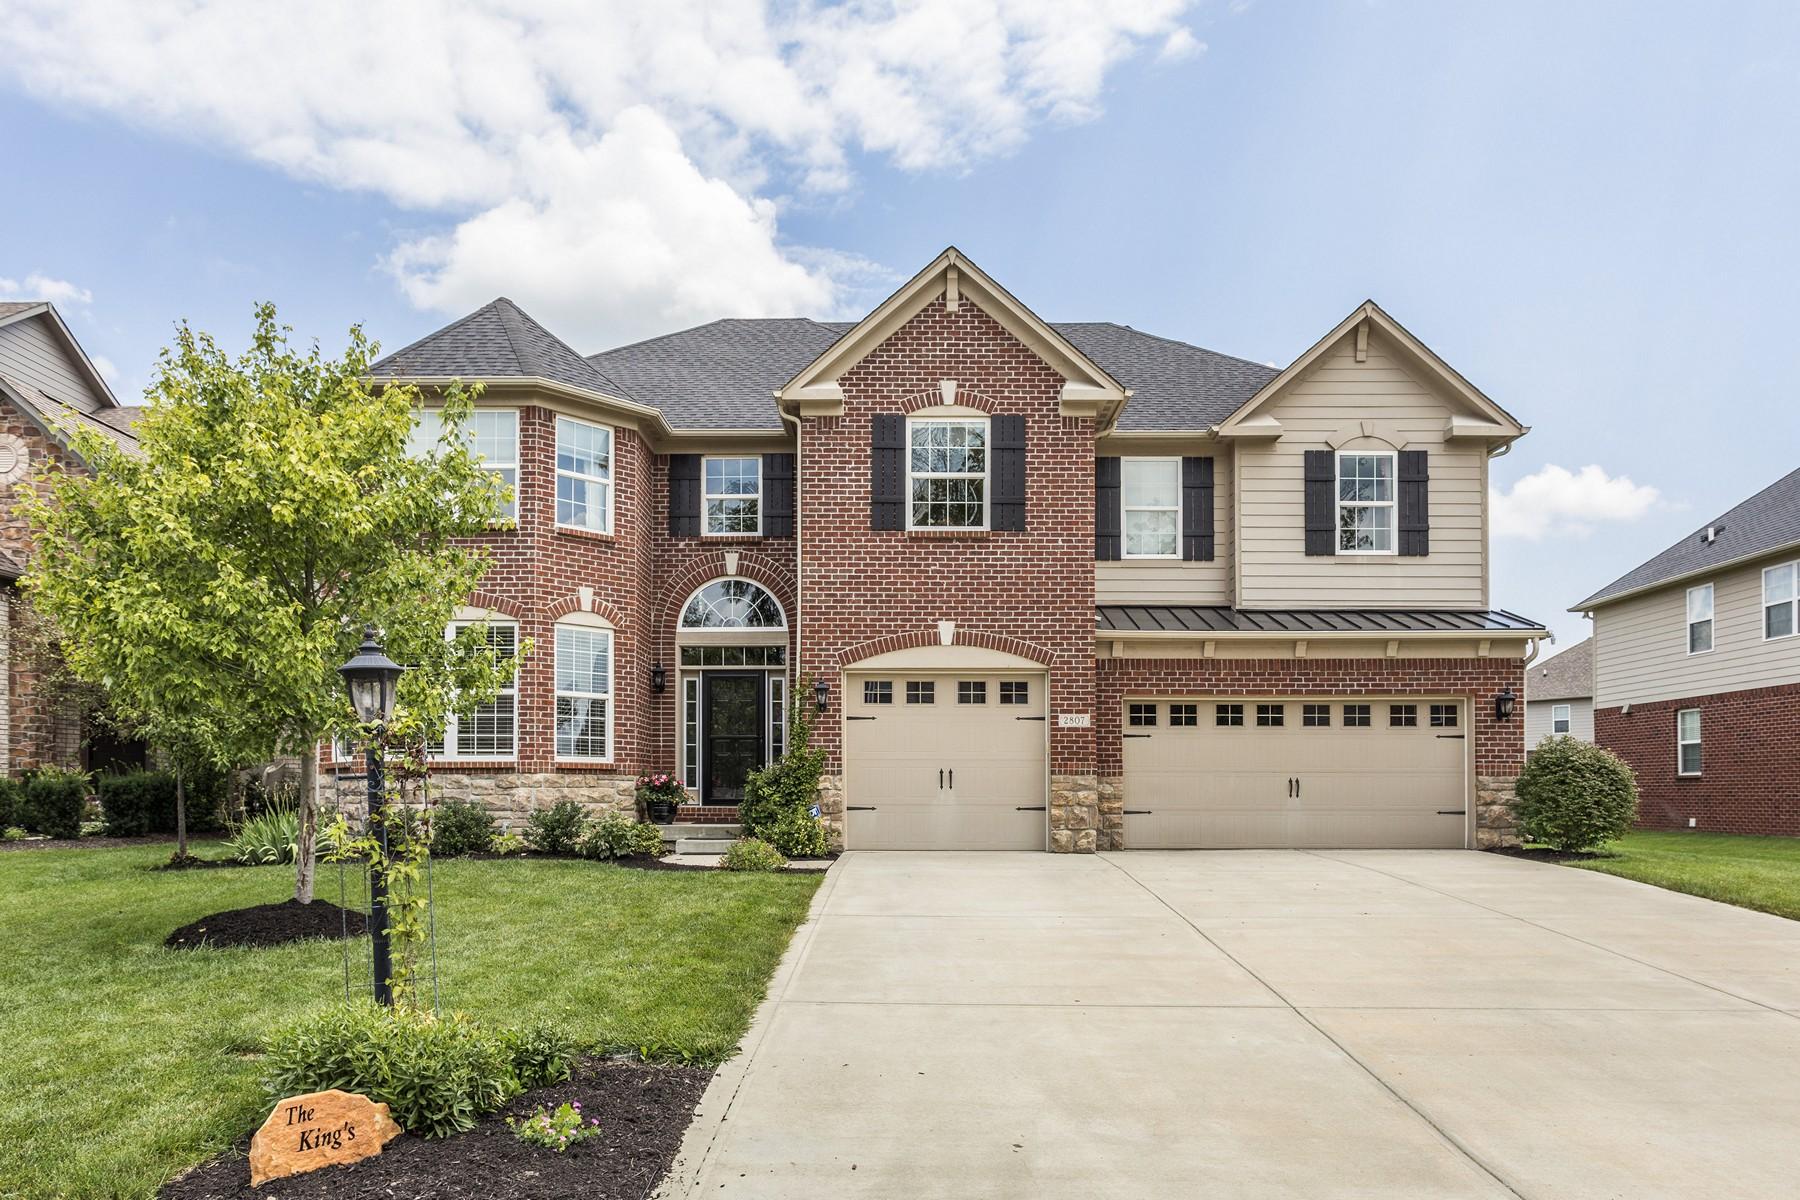 Villa per Vendita alle ore Beautiful Home 2807 Newbury Court Zionsville, Indiana, 46077 Stati Uniti